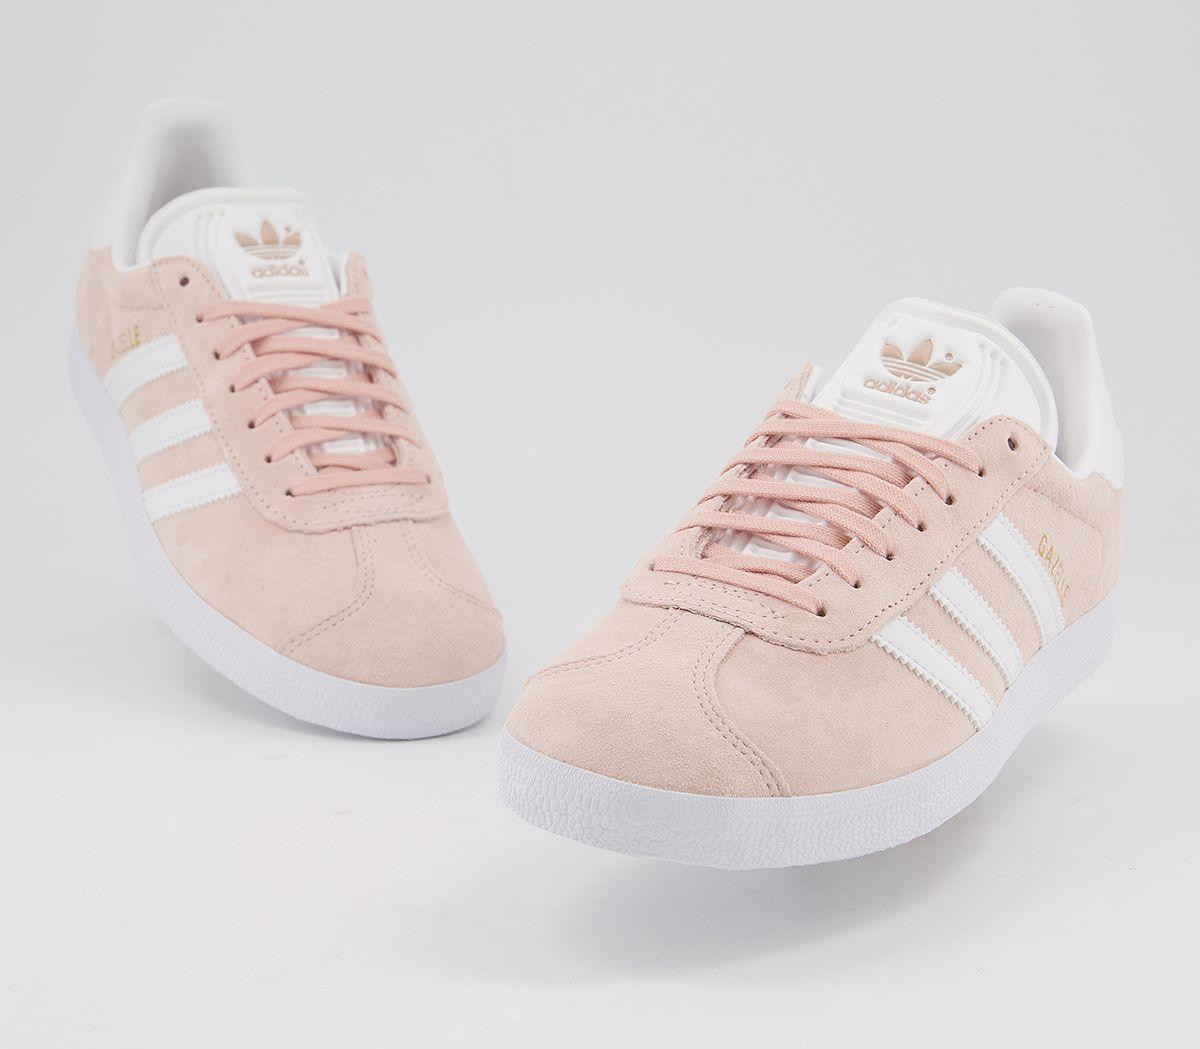 Adidas-Gazelle-Vapour-Pink-White-Trainers-Shoes thumbnail 8